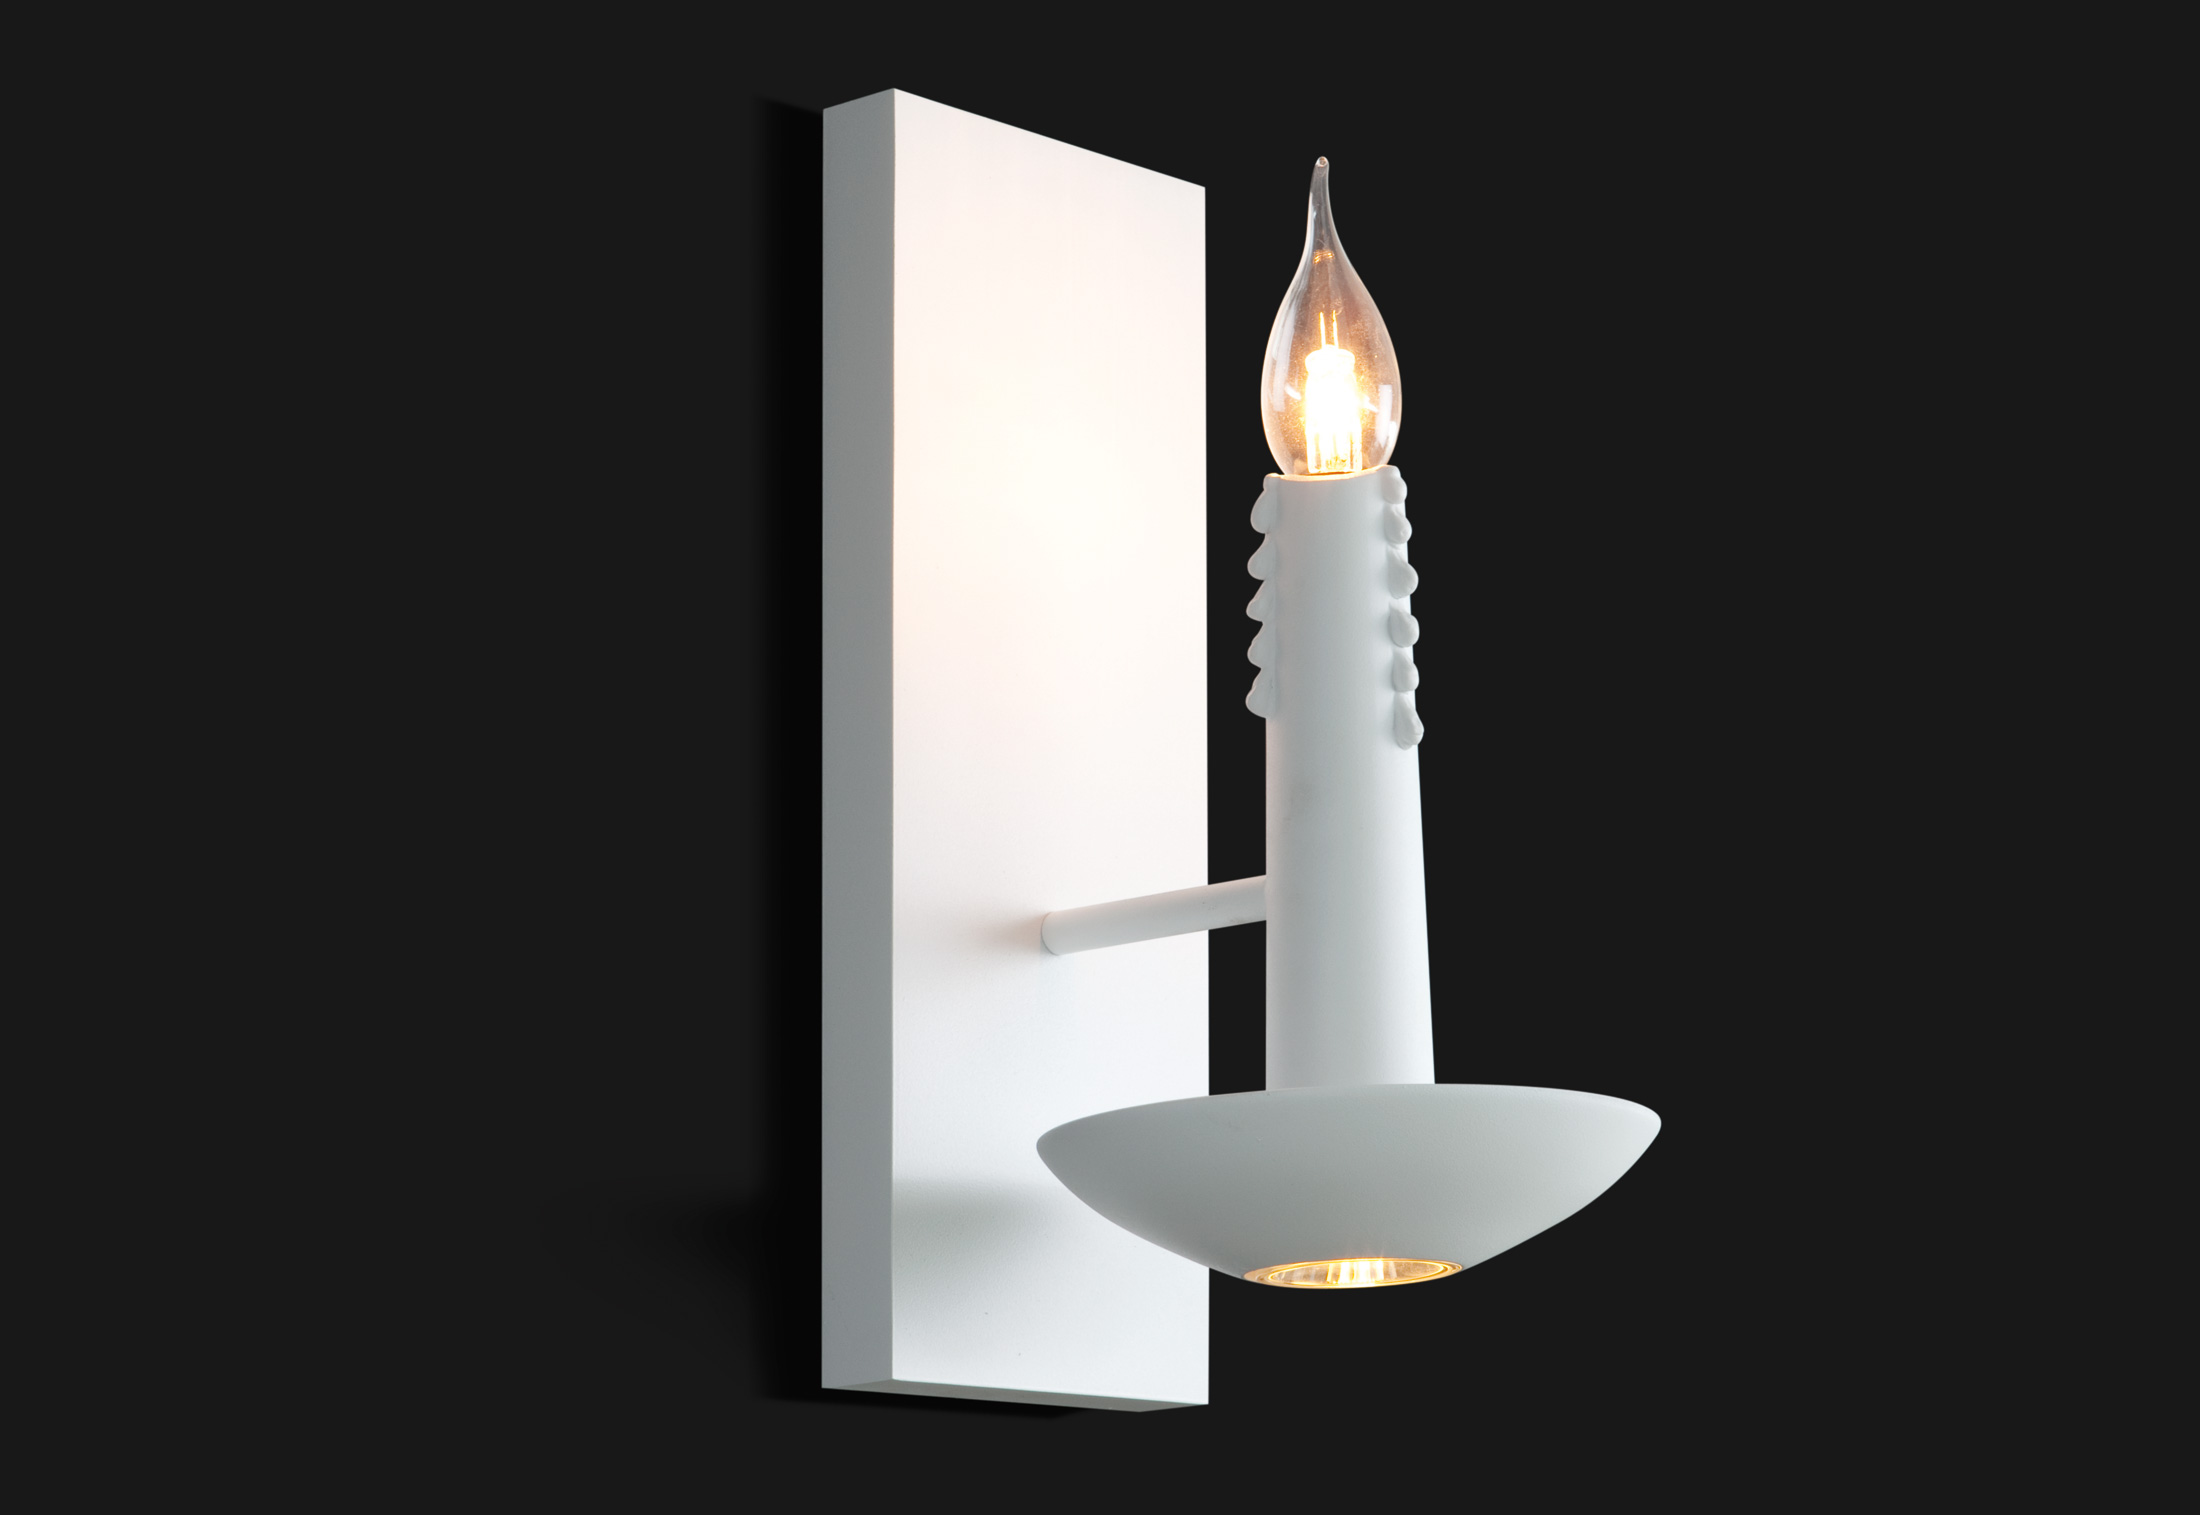 Brand Van Egmond Floating Candles.Floating Candles Wall Lamp By Brand Van Egmond Stylepark